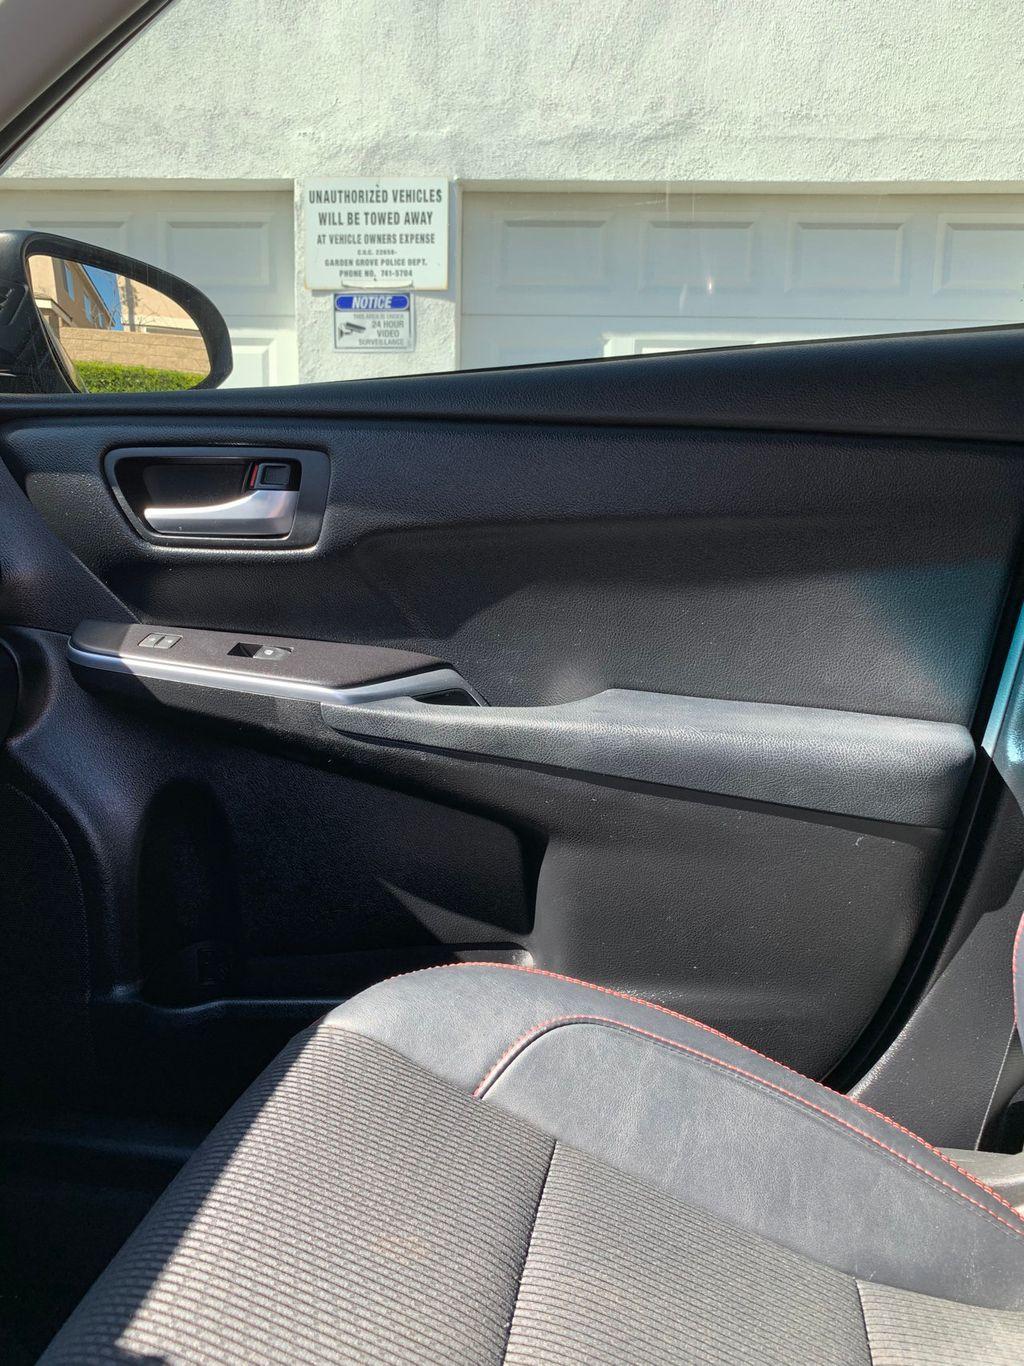 2017 Hyundai Santa Fe Sport 2.4L Automatic - 18574995 - 40